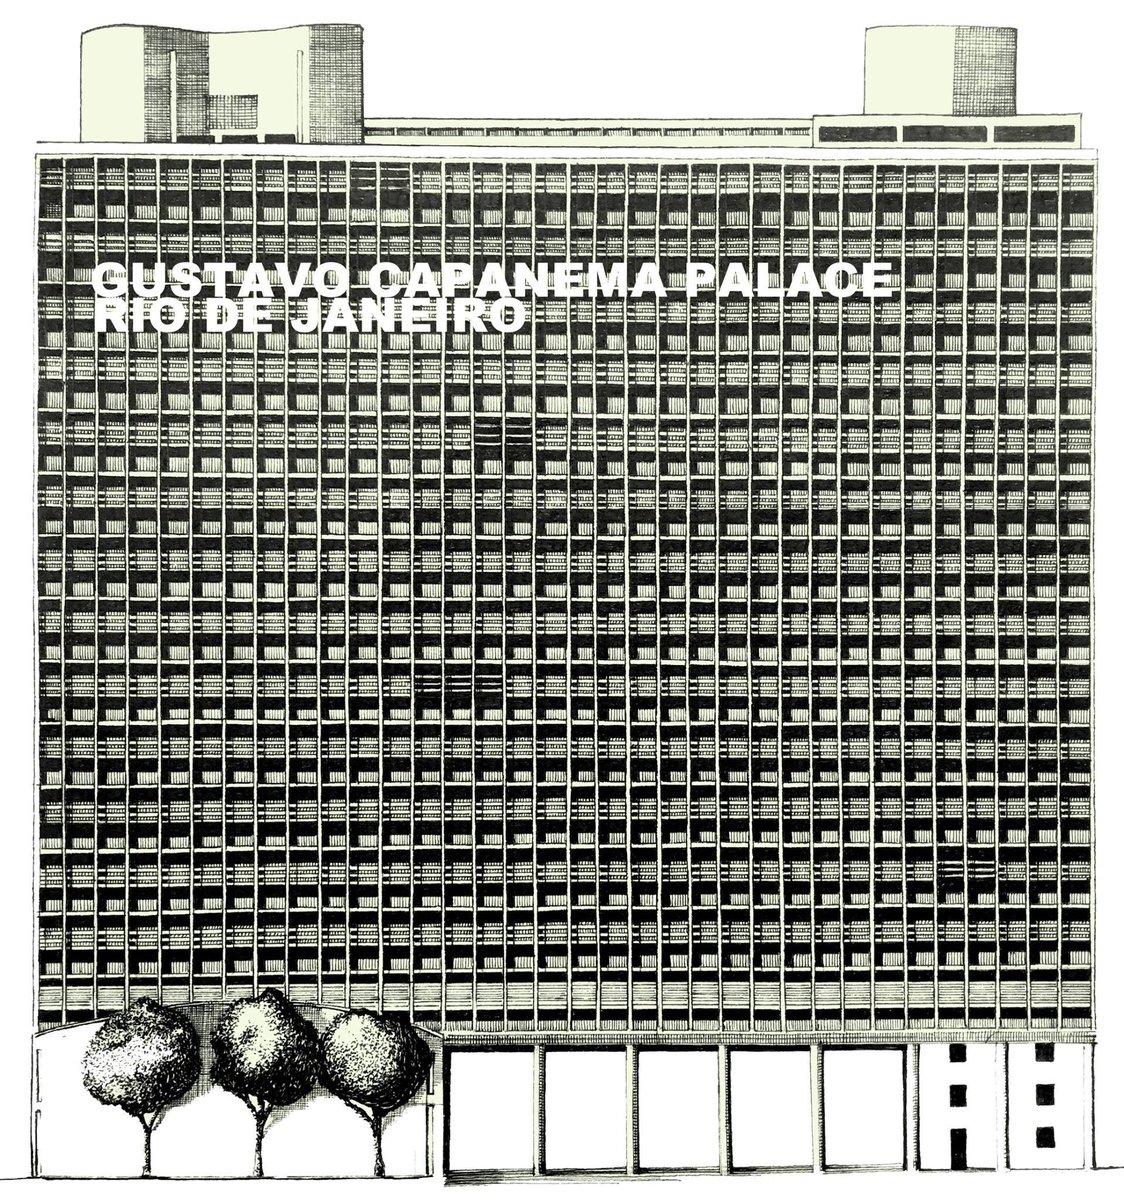 Drawn palace small Drawn Twitter:  NickCouplandArt windows